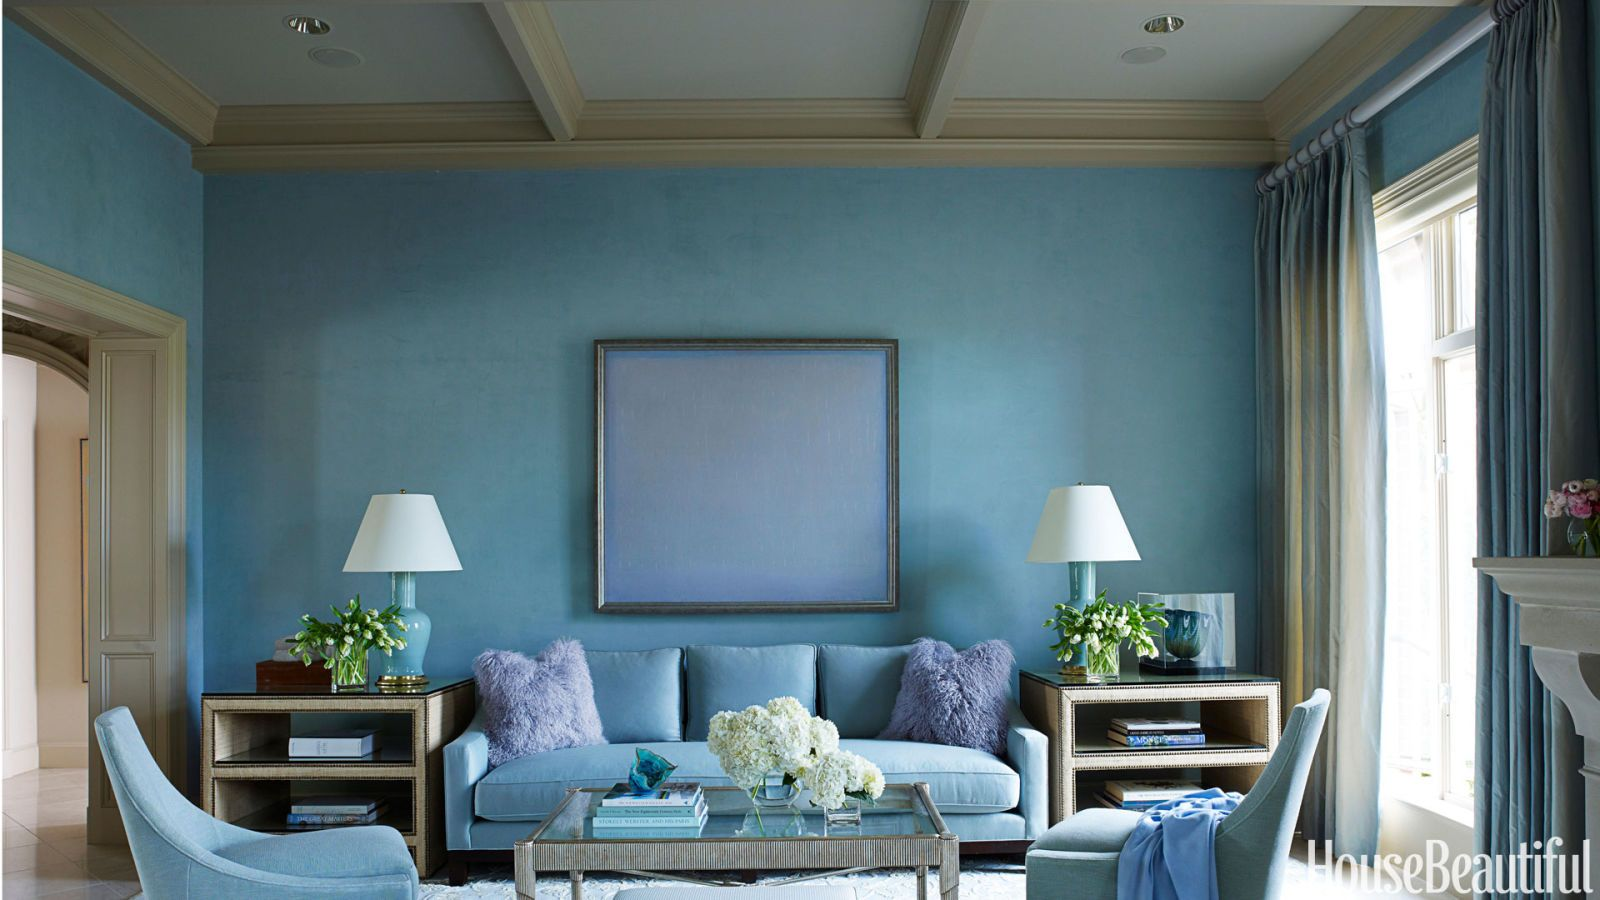 Decorating Problems Solved - Design Dilemmas